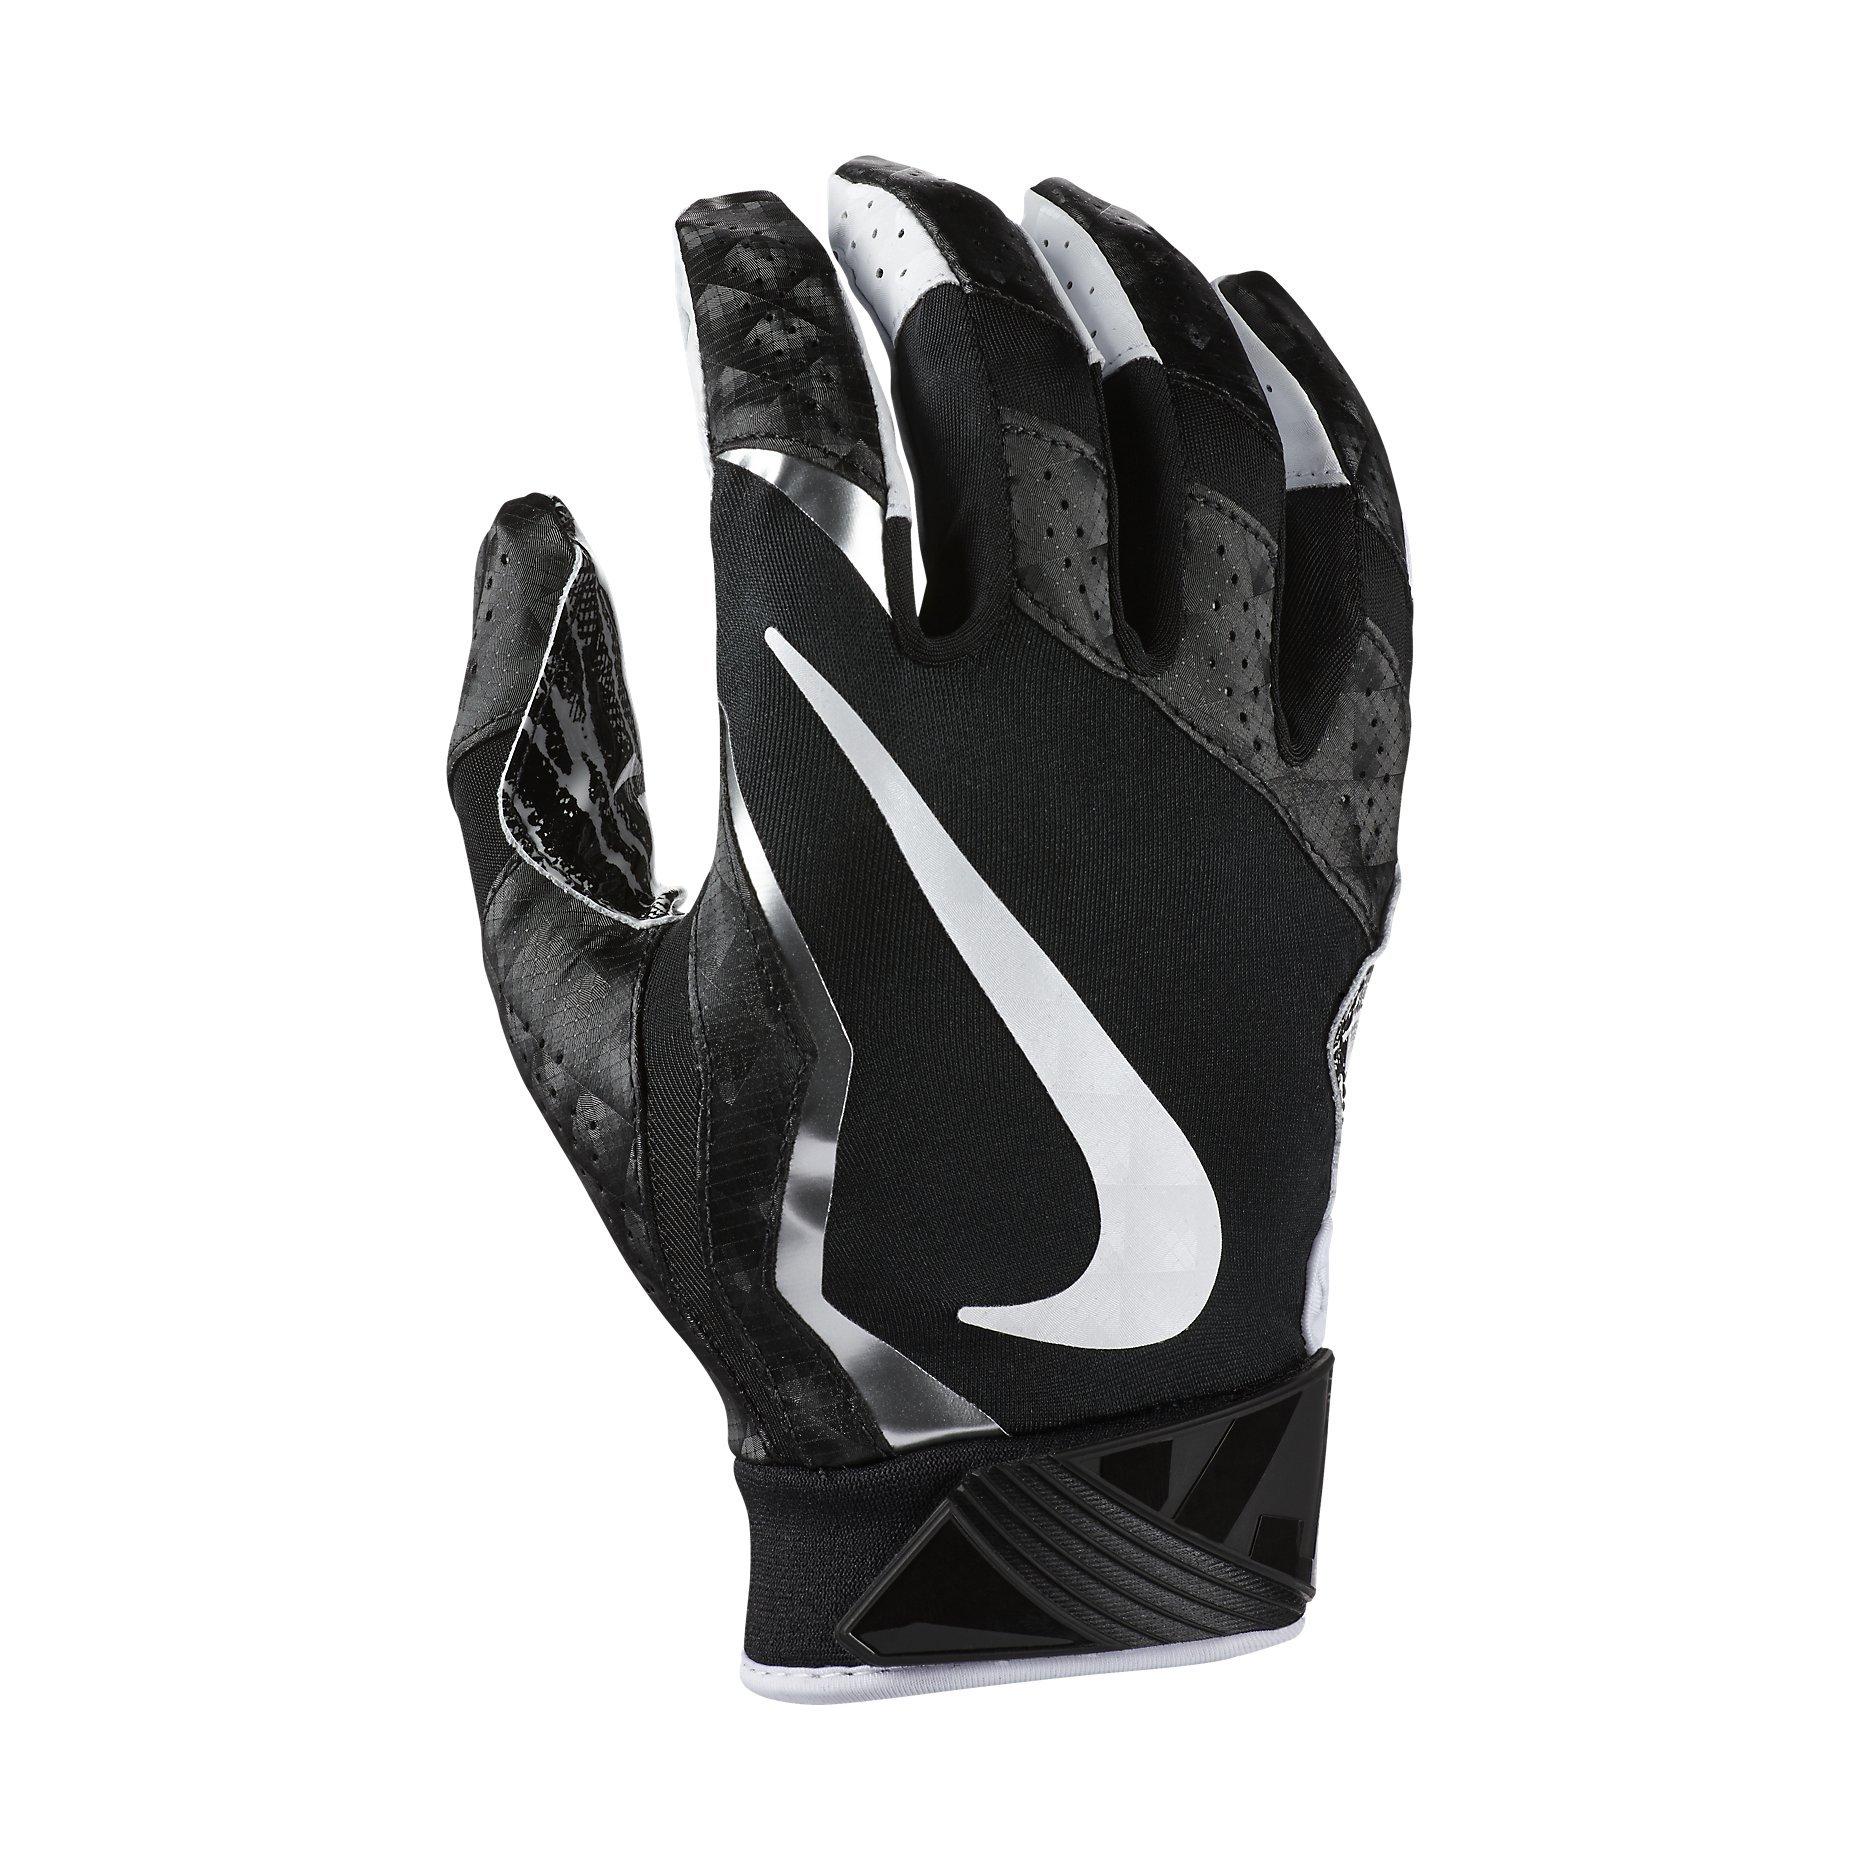 Nike Vapor Jet 4.0 Football Gloves Size Small